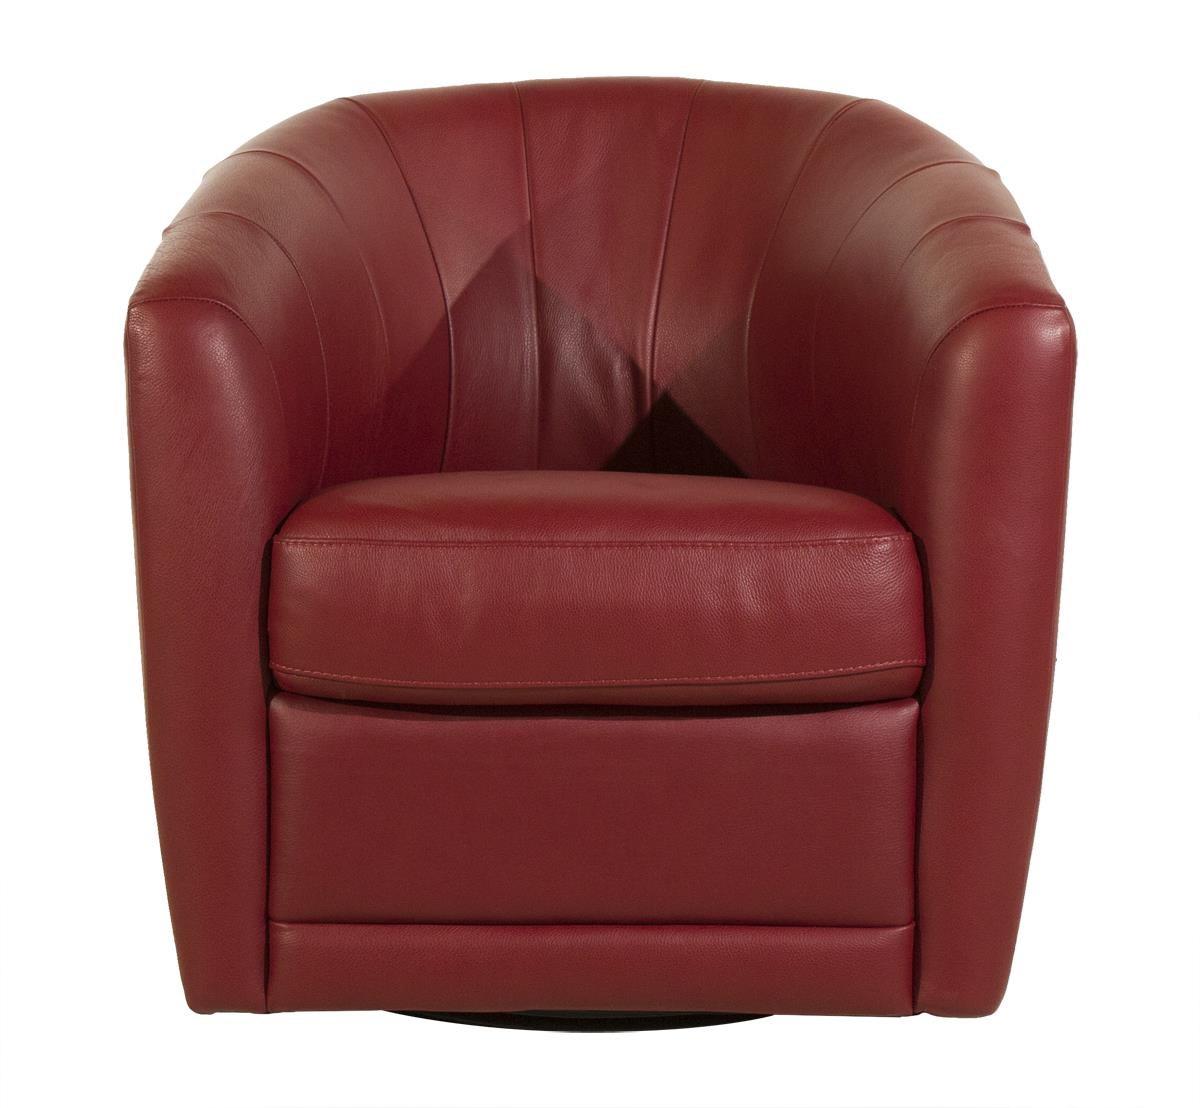 swivel upholstered chairs chairperson natuzzi editions giada chair homeworld furniture